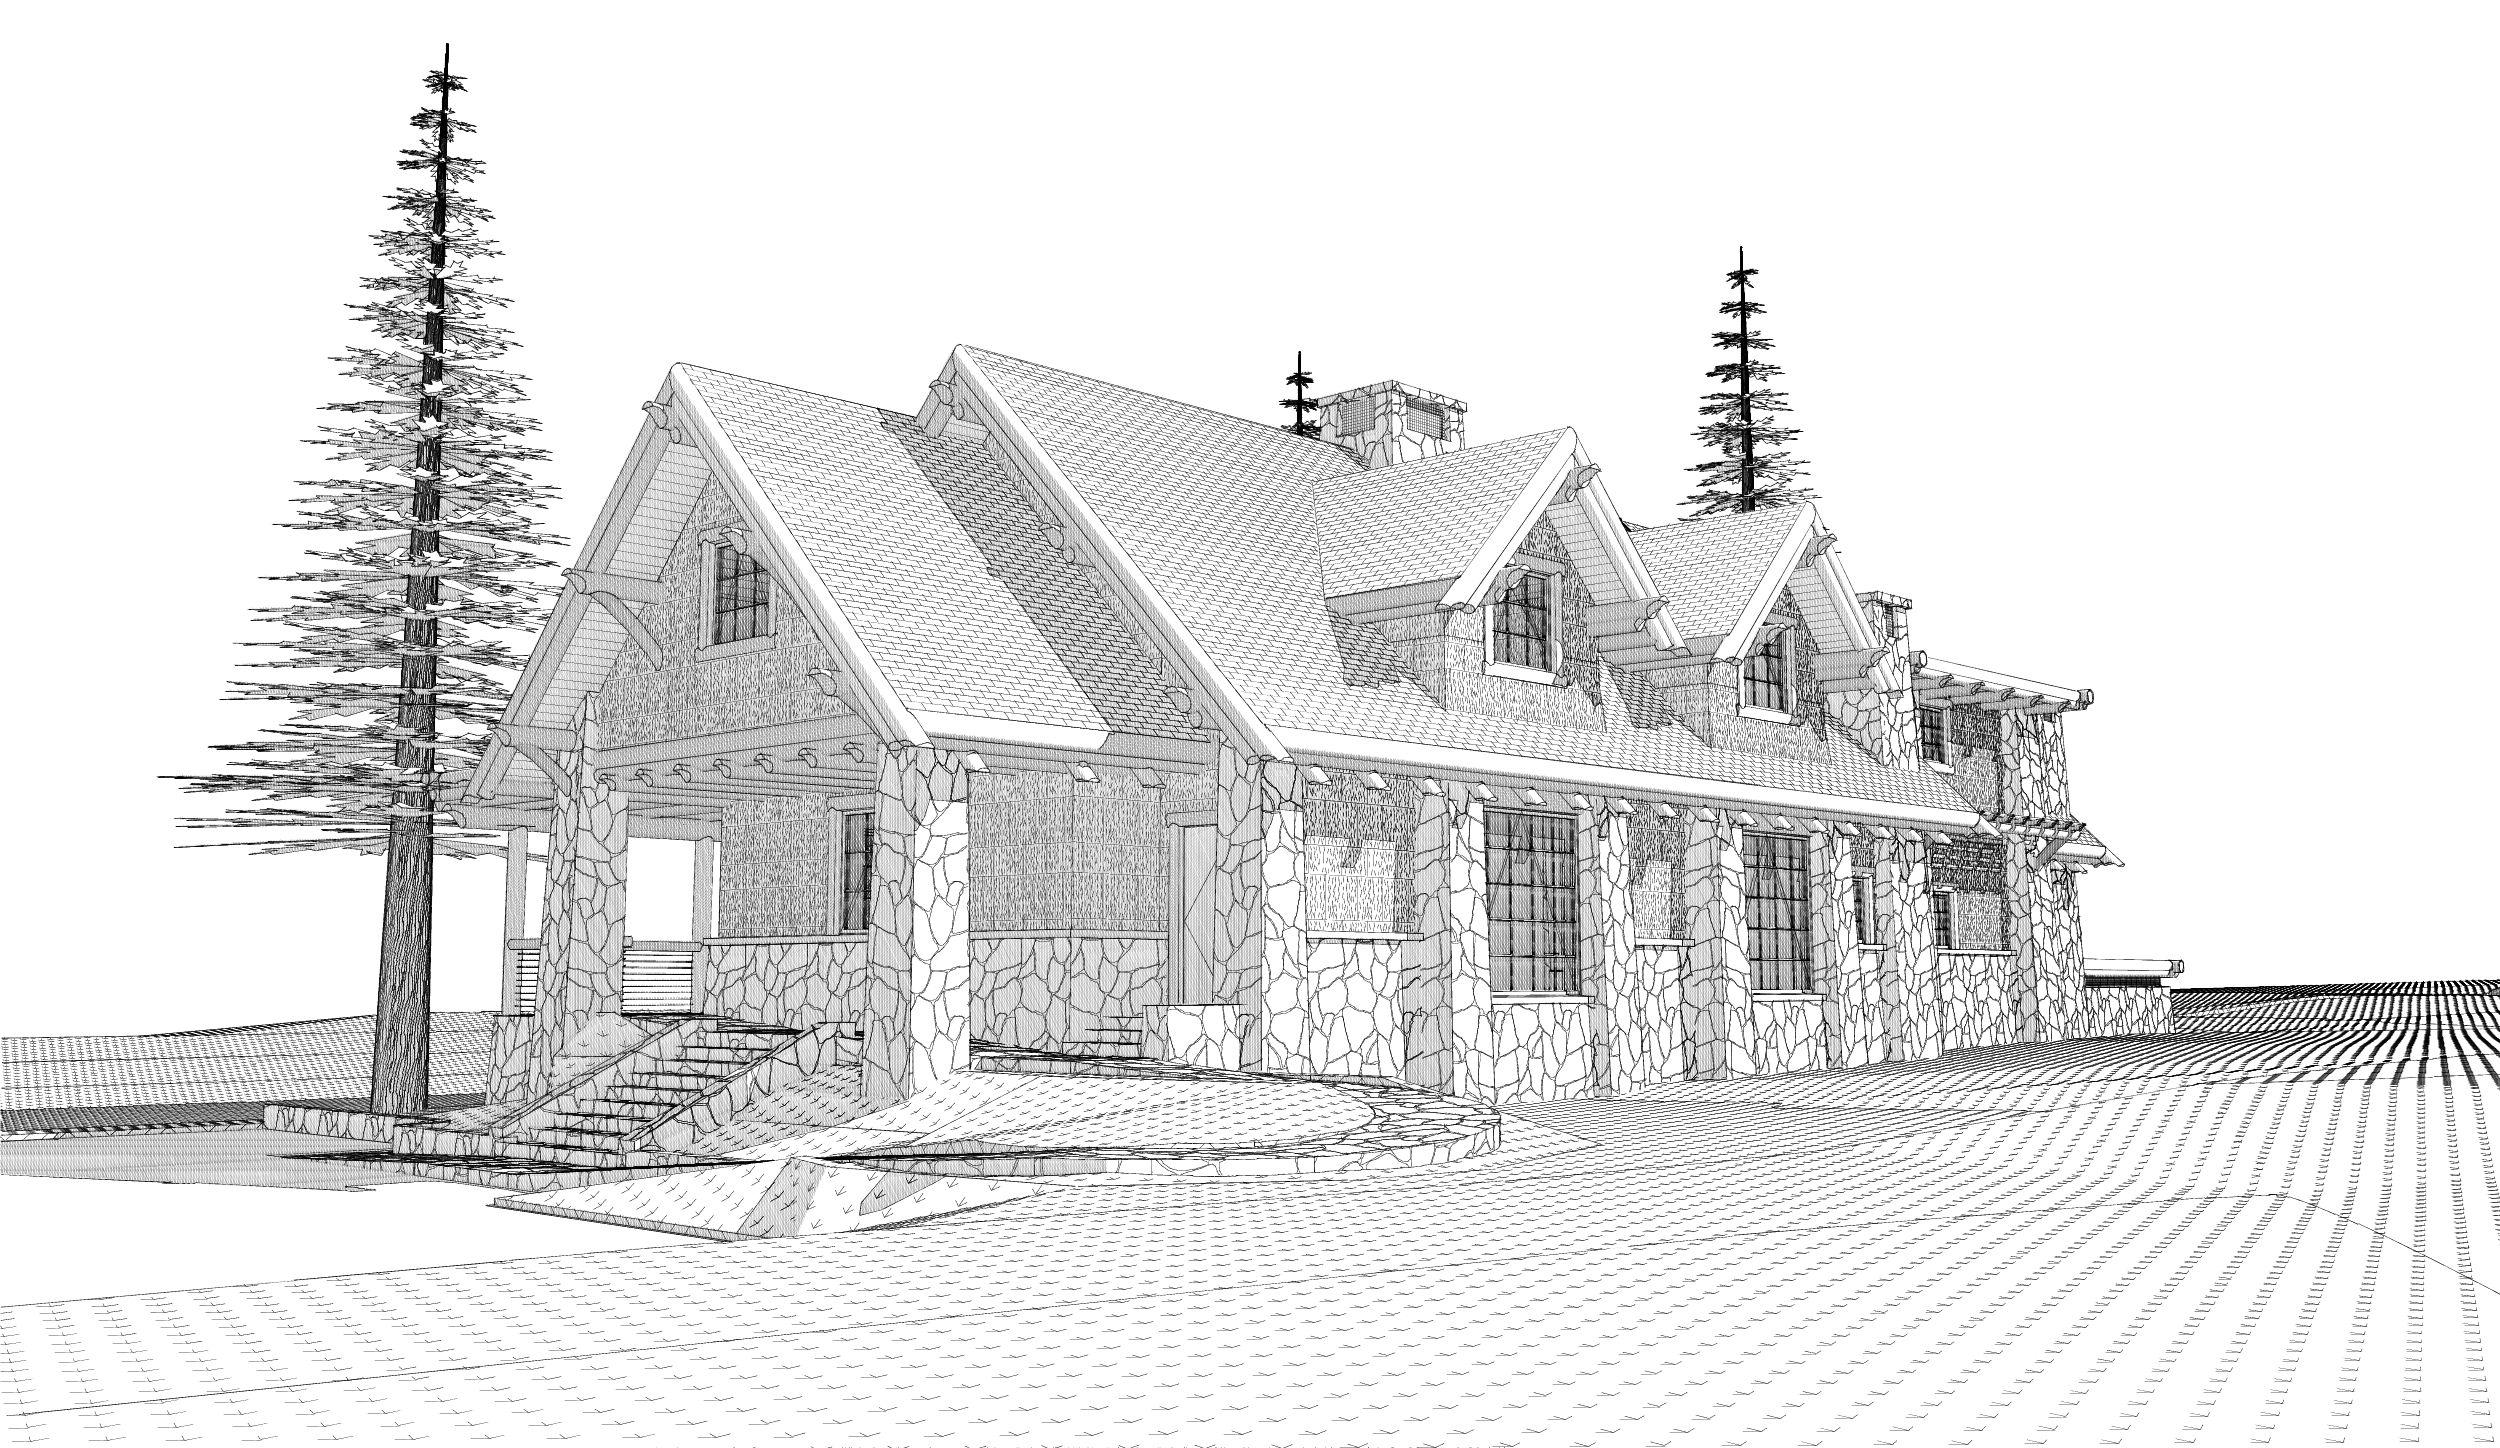 ARCHITECT RUSTIC DESIGN HOUSE NC 05.jpg